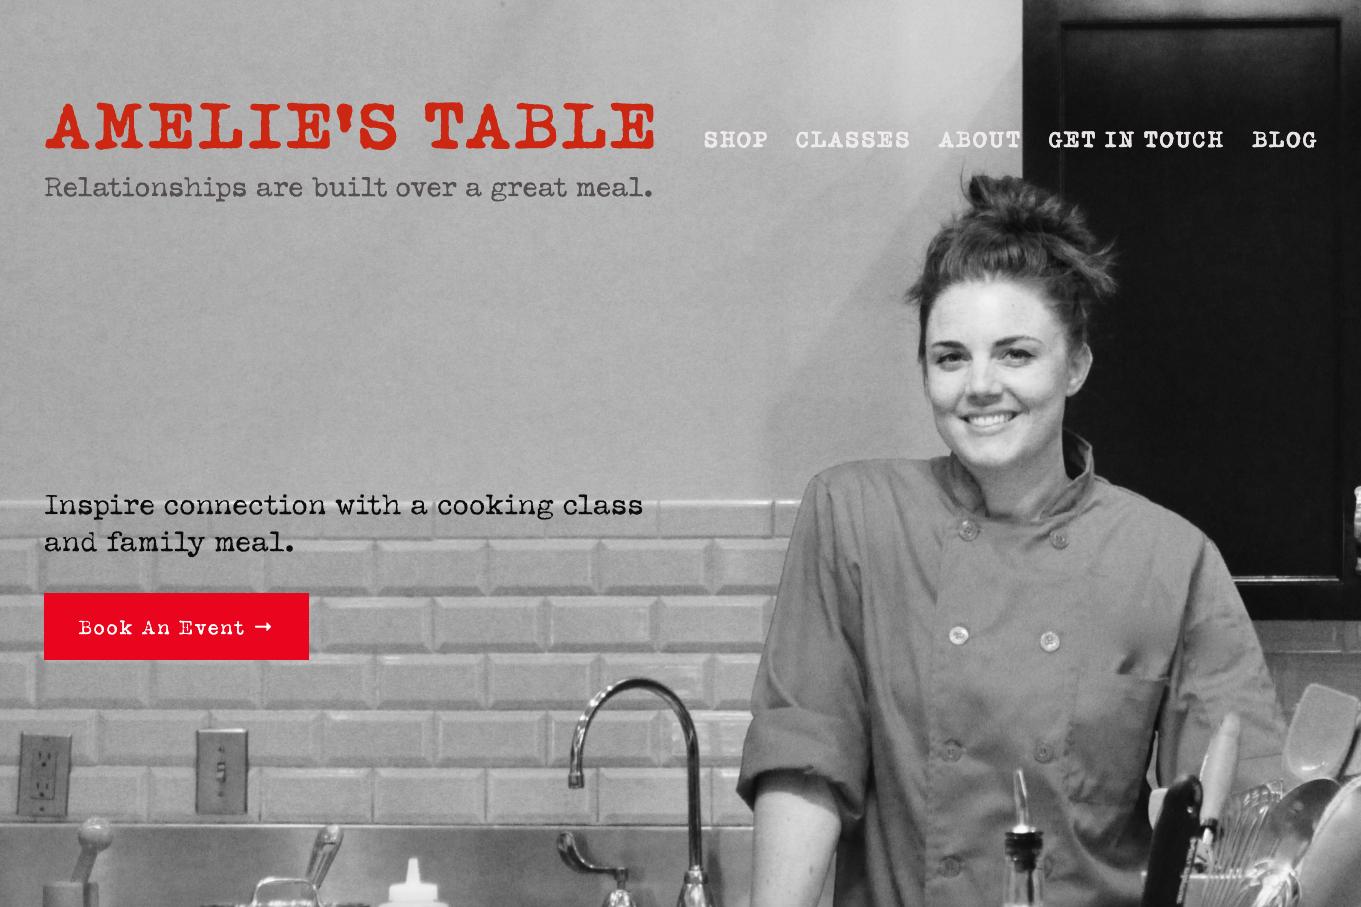 AMÉLIE'S TABLE website design - content curation - messaging & digital branding - SEO - marketing collateral